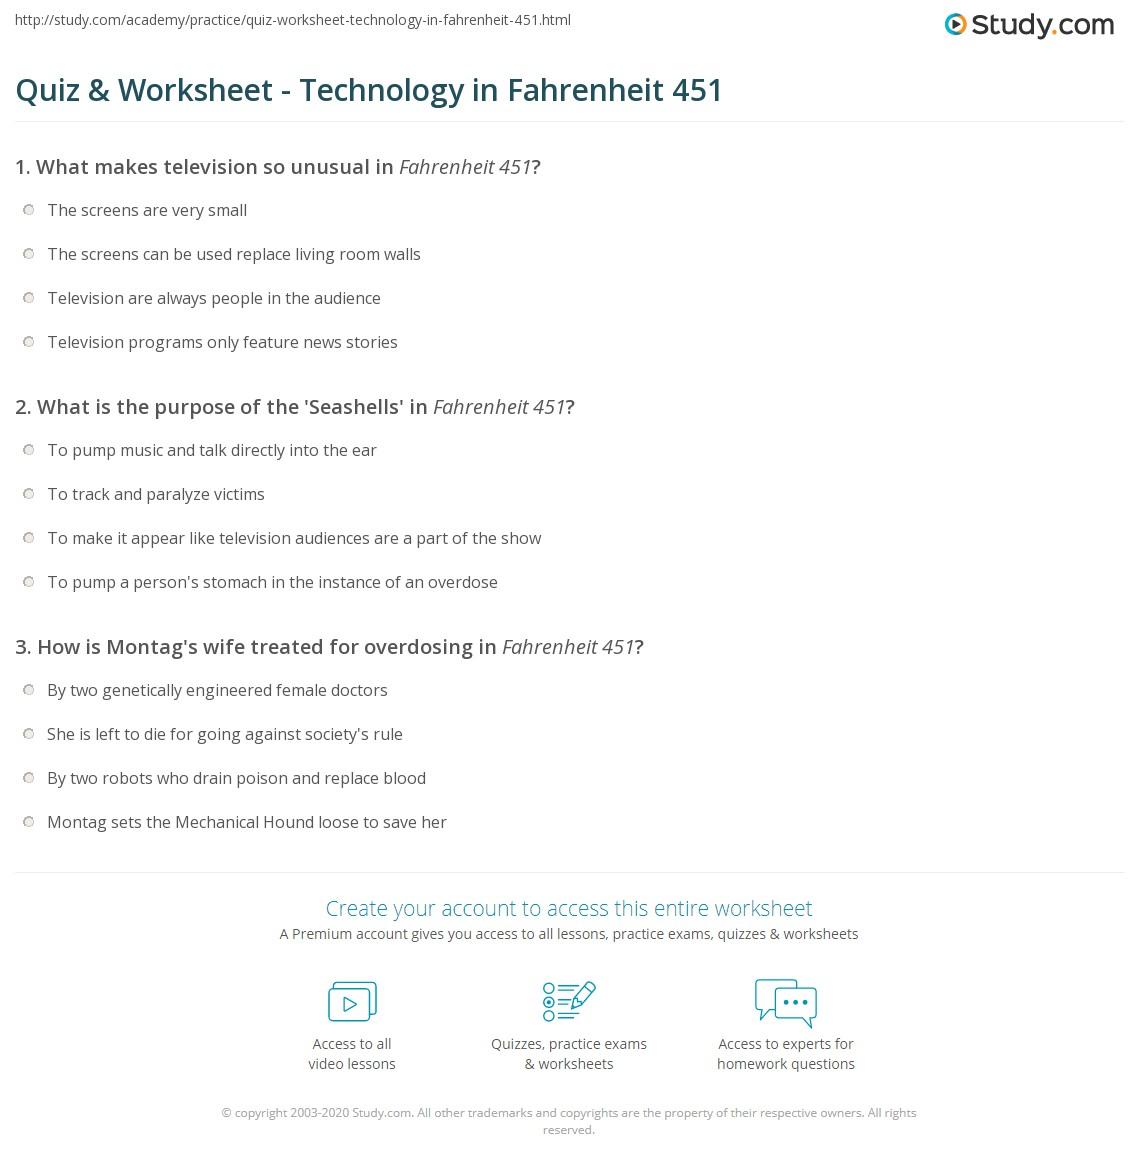 Worksheets Fahrenheit 451 Worksheets quiz worksheet technology in fahrenheit 451 study com print worksheet